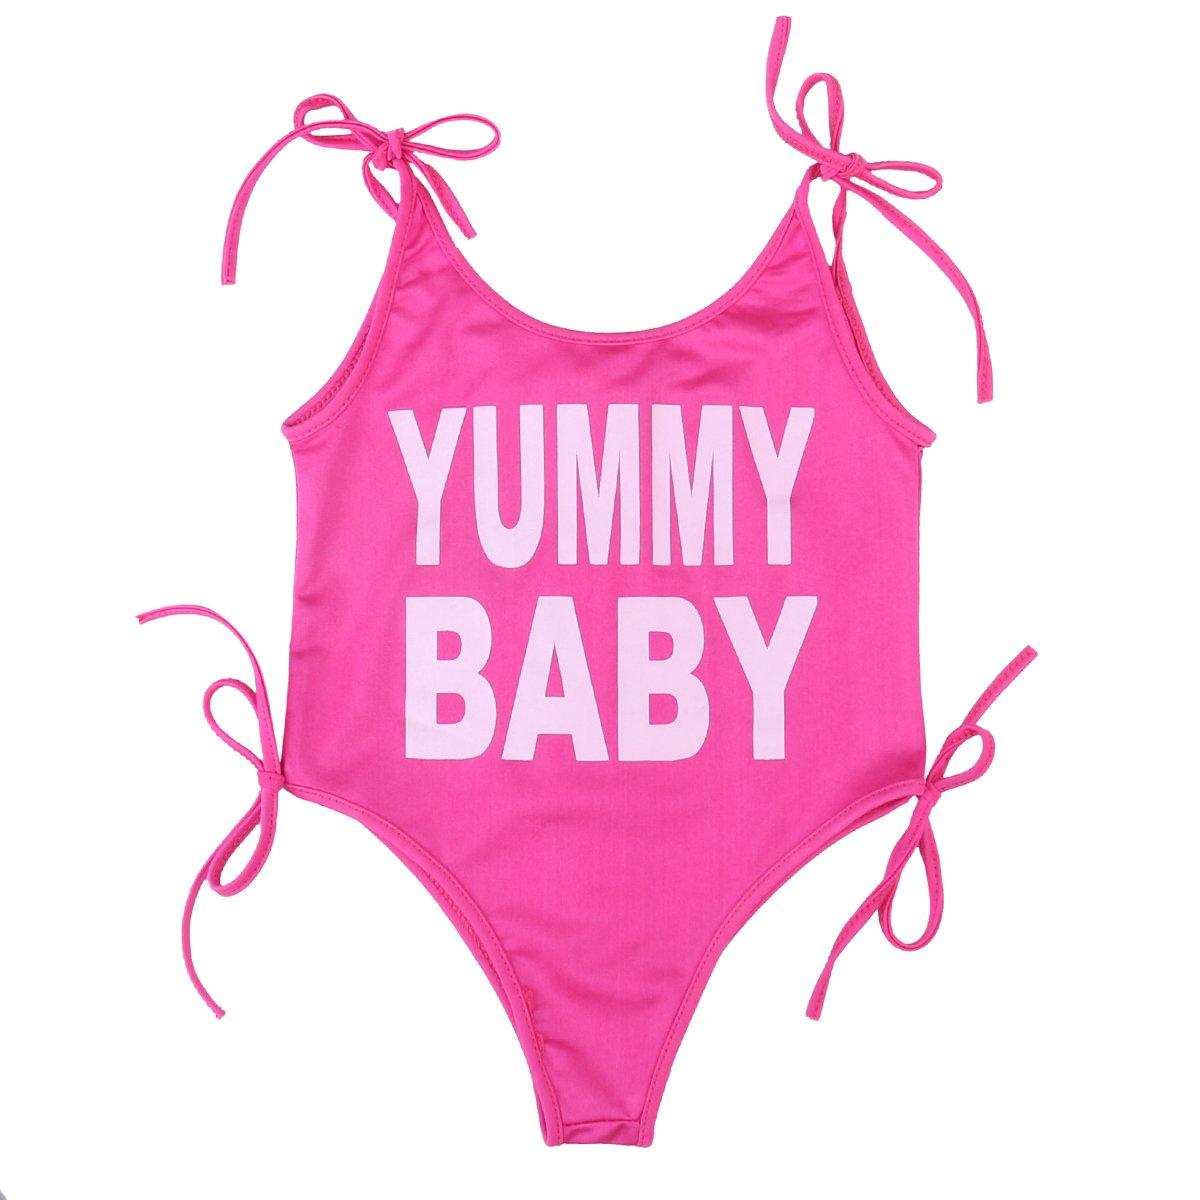 Amazon.com: Lily.Pie Mom Baby Girls Matching Swimwear Outfits Women ...